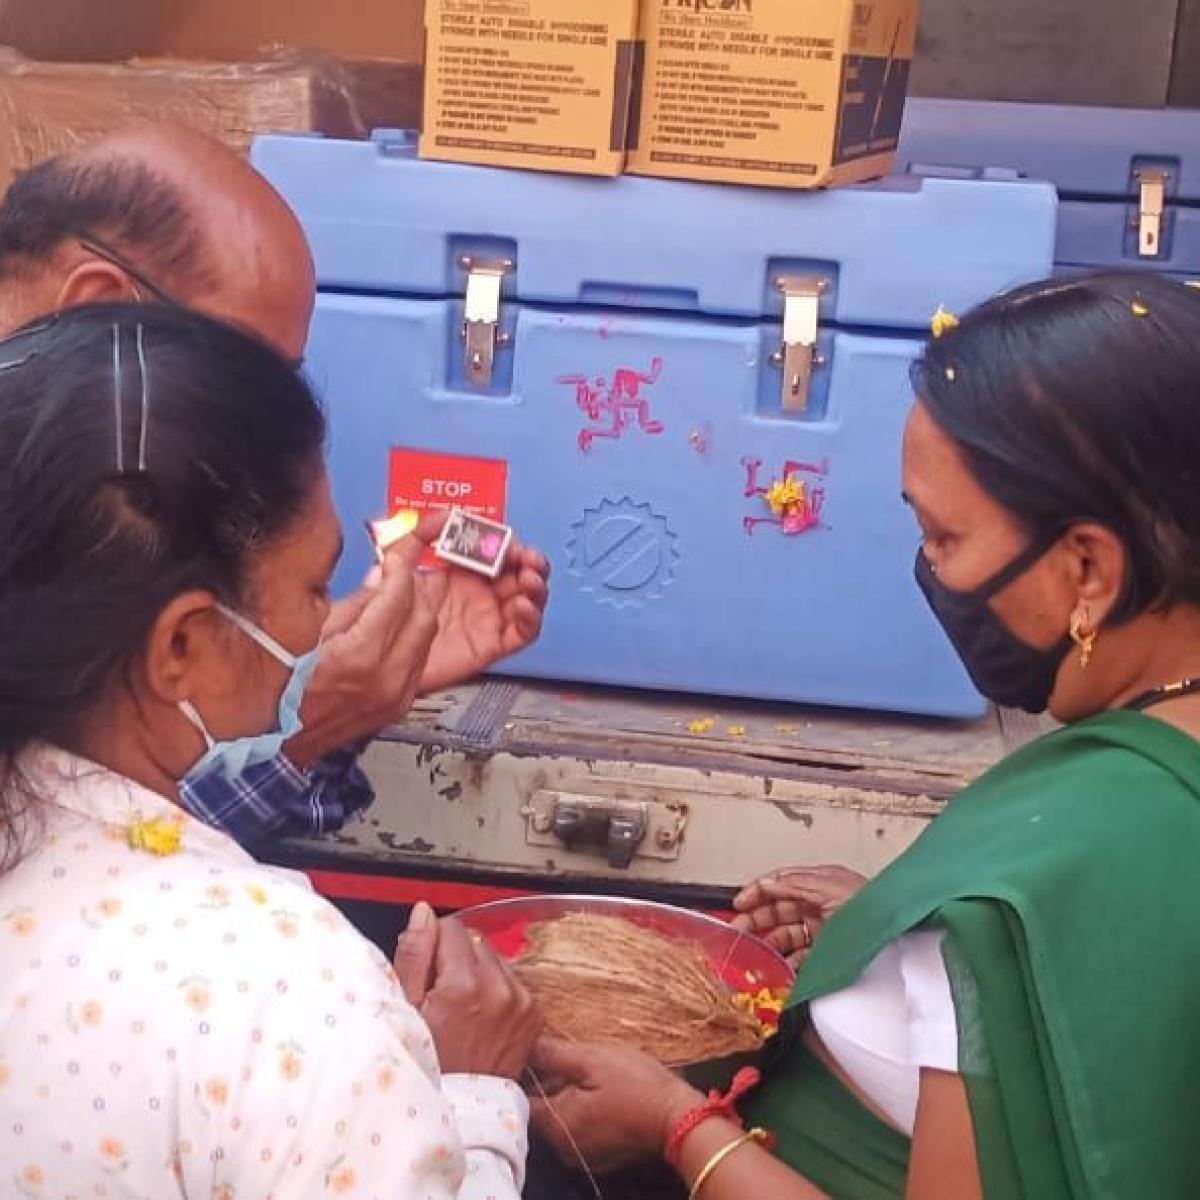 Madhya Pradesh: Record single day cases in Ratlam for 2021; 65 test positive